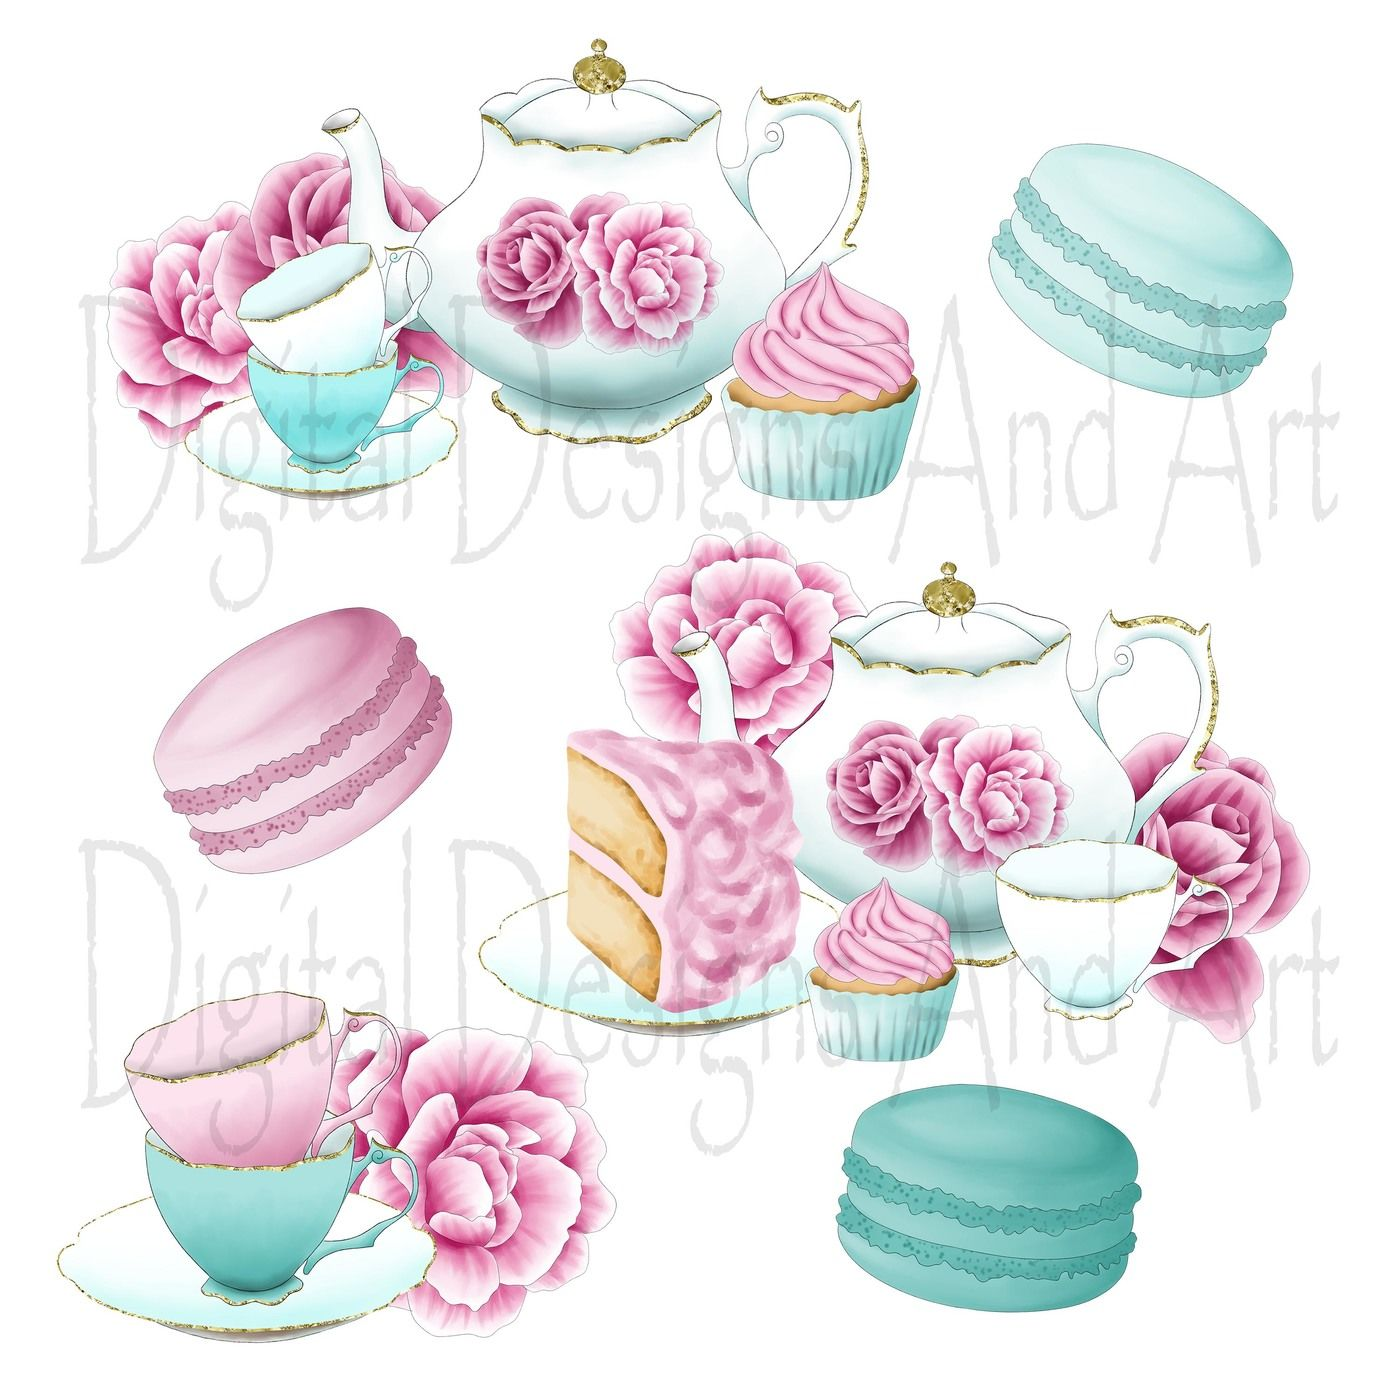 Afternoon tea clipart By DigitalDesignsAndArt.